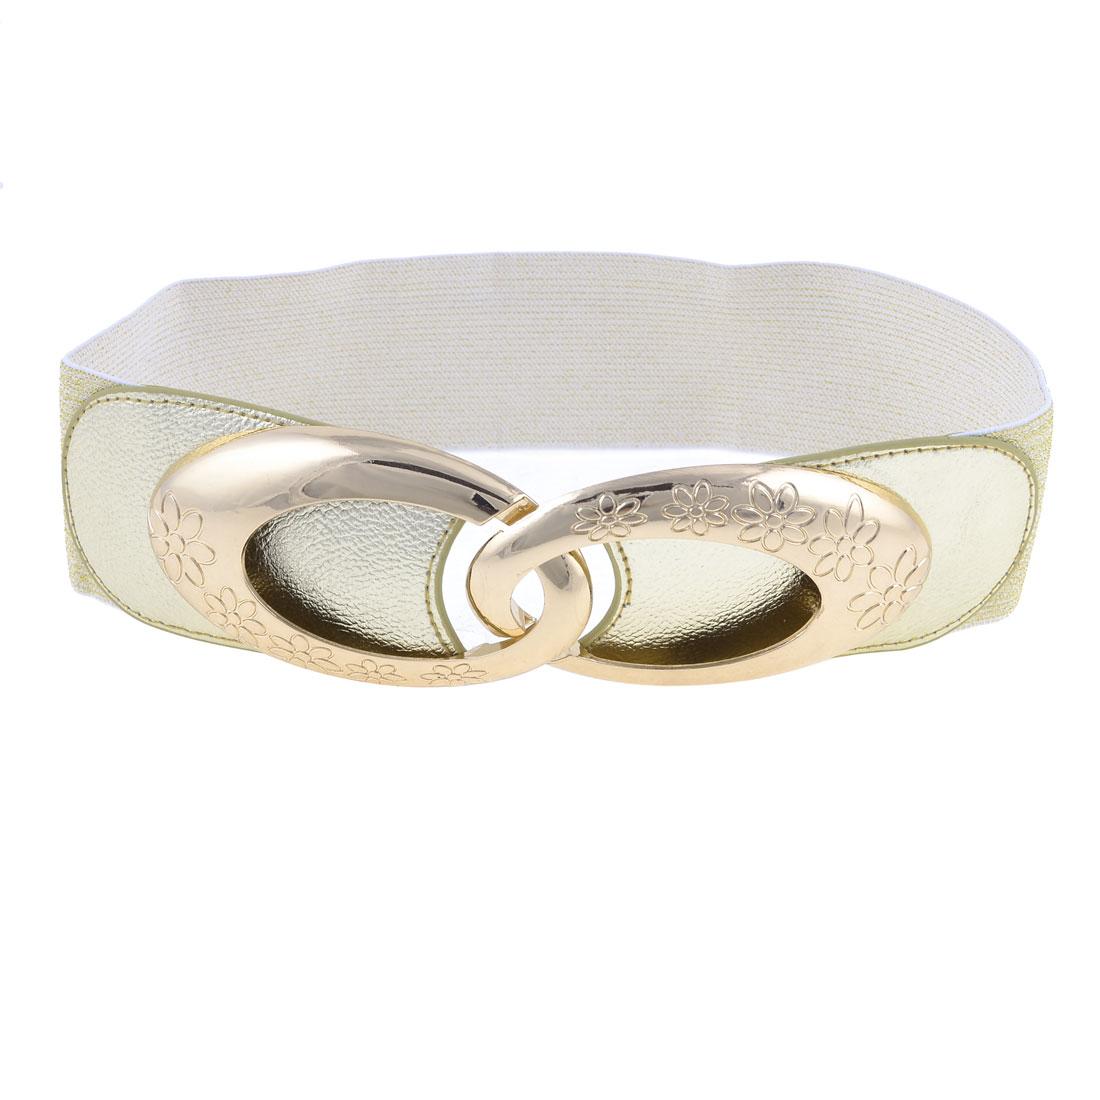 Lady Gold Tone Plastic Interlocking Buckle Elastic Waistband Cinch Belt